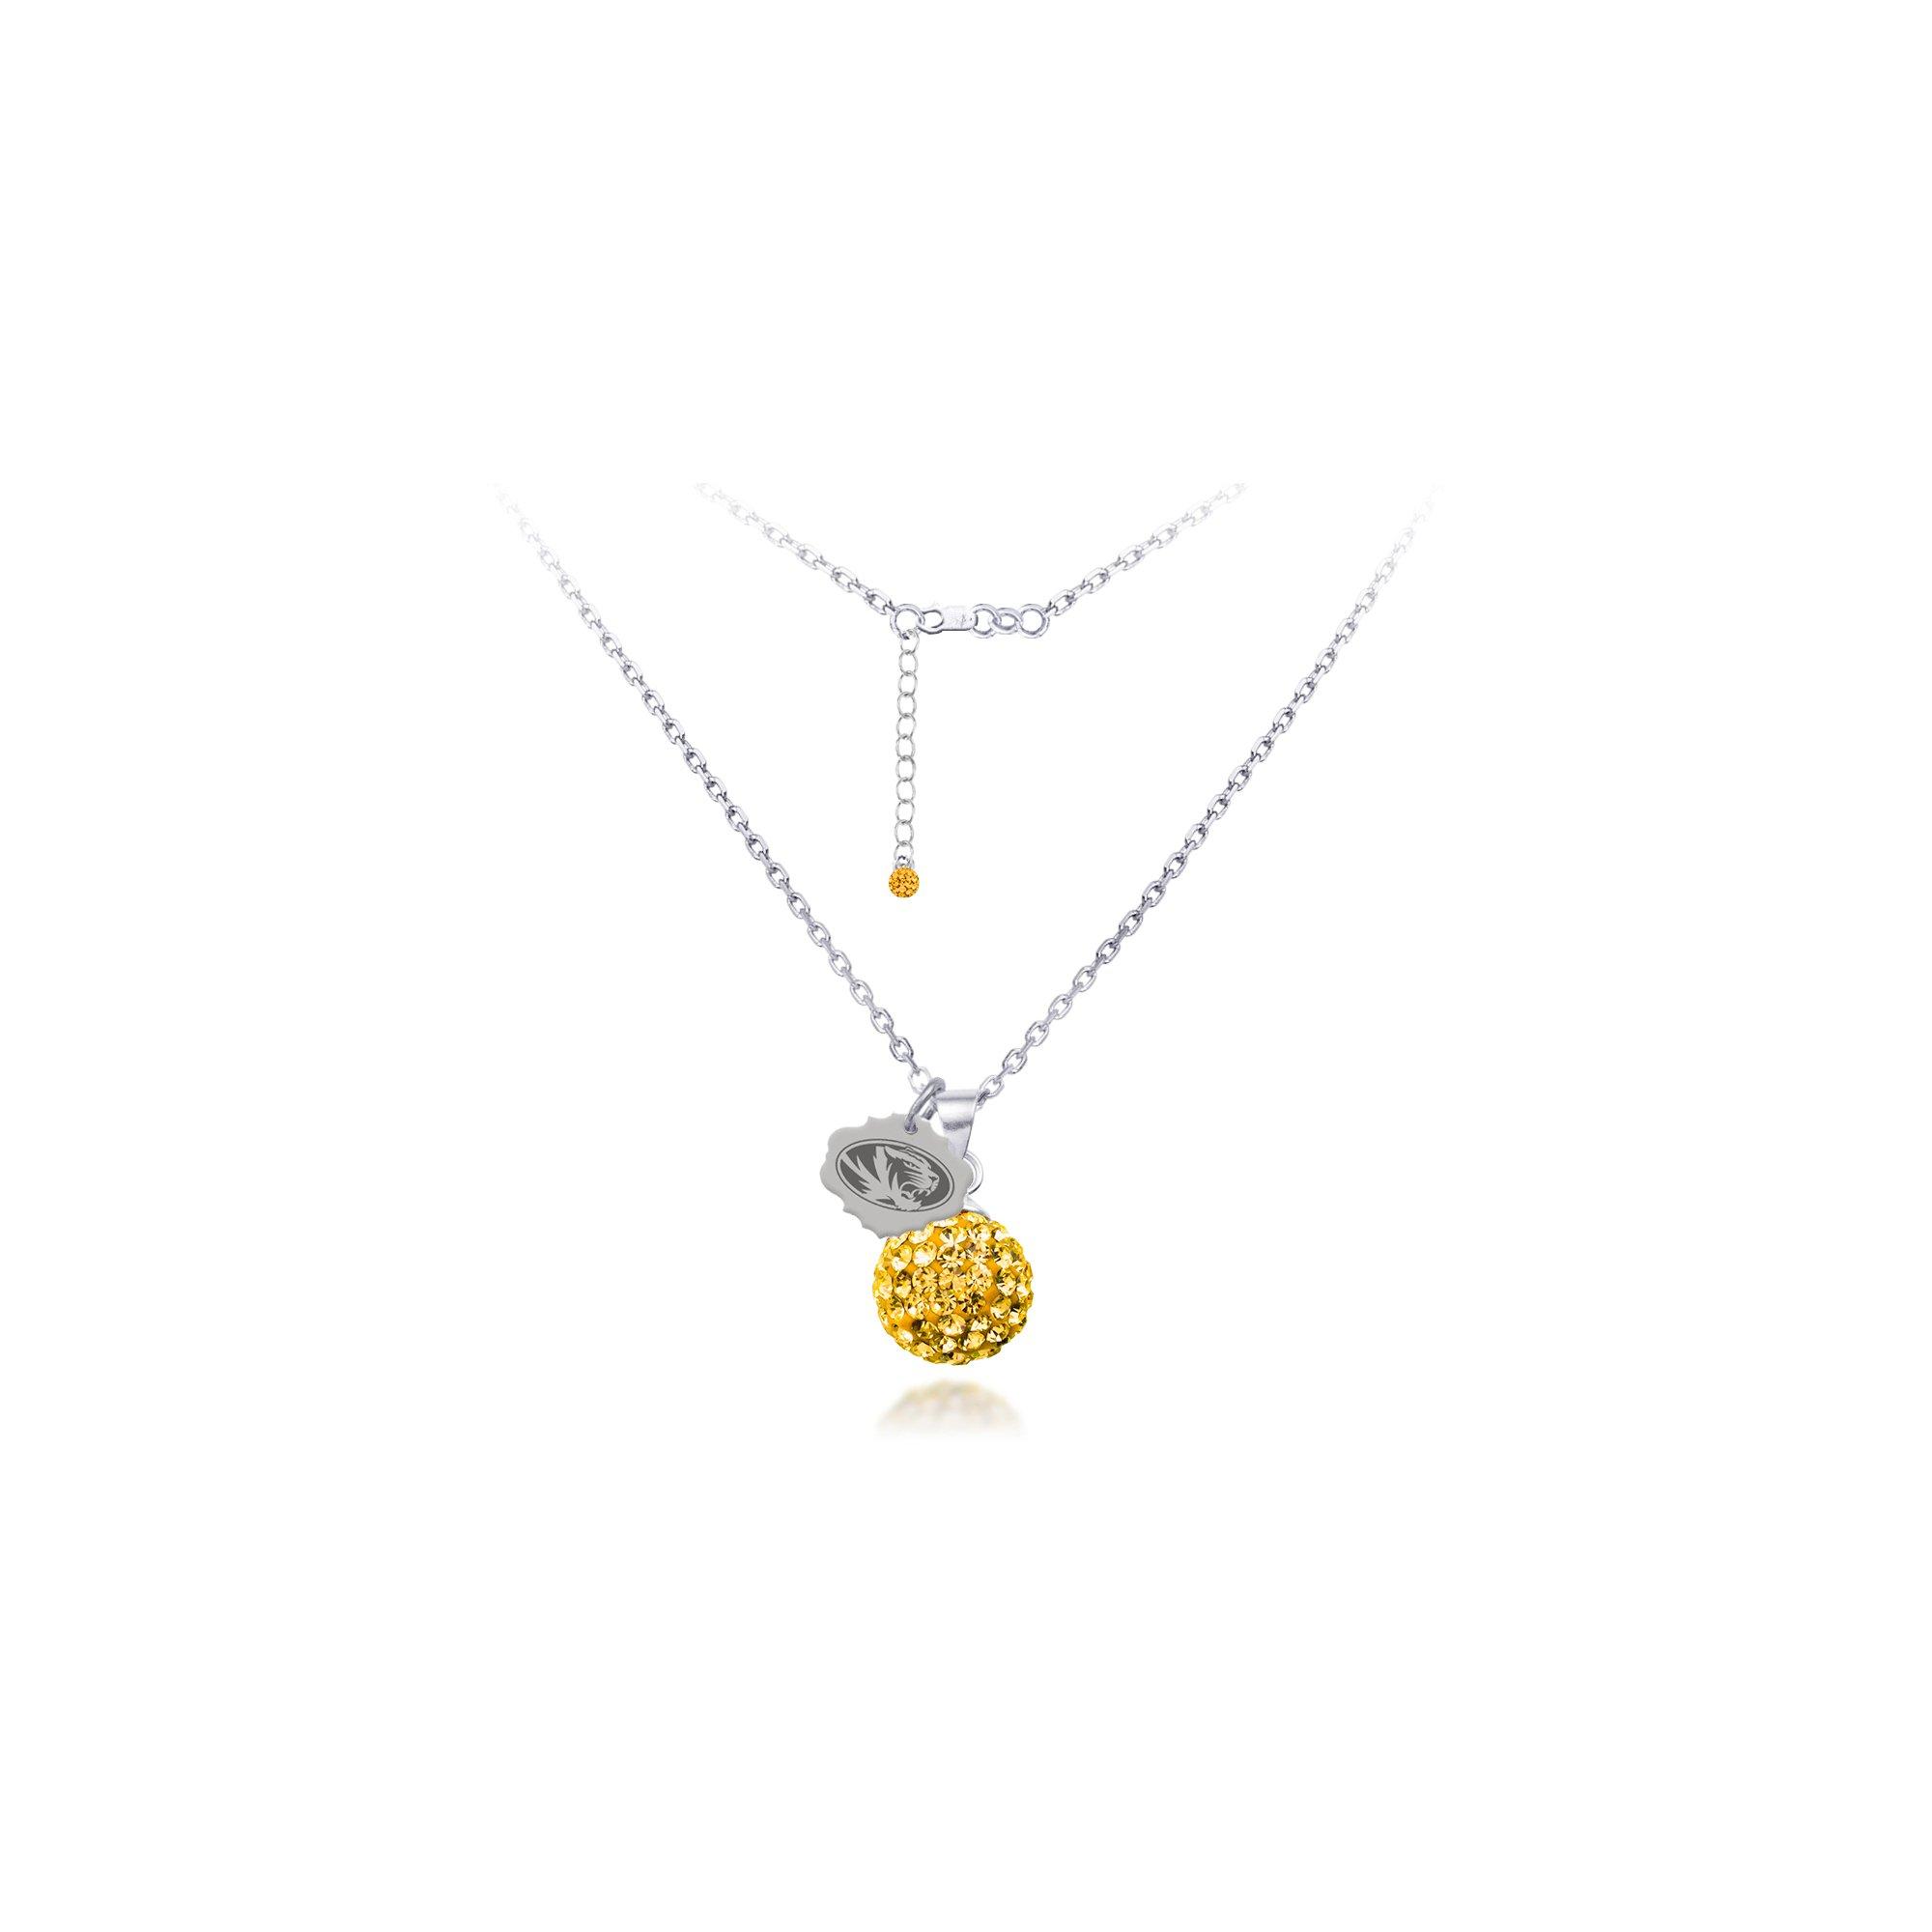 DiamondJewelryNY Silver Pendant, Spirit Sphere Neck/Univ Of Missouri